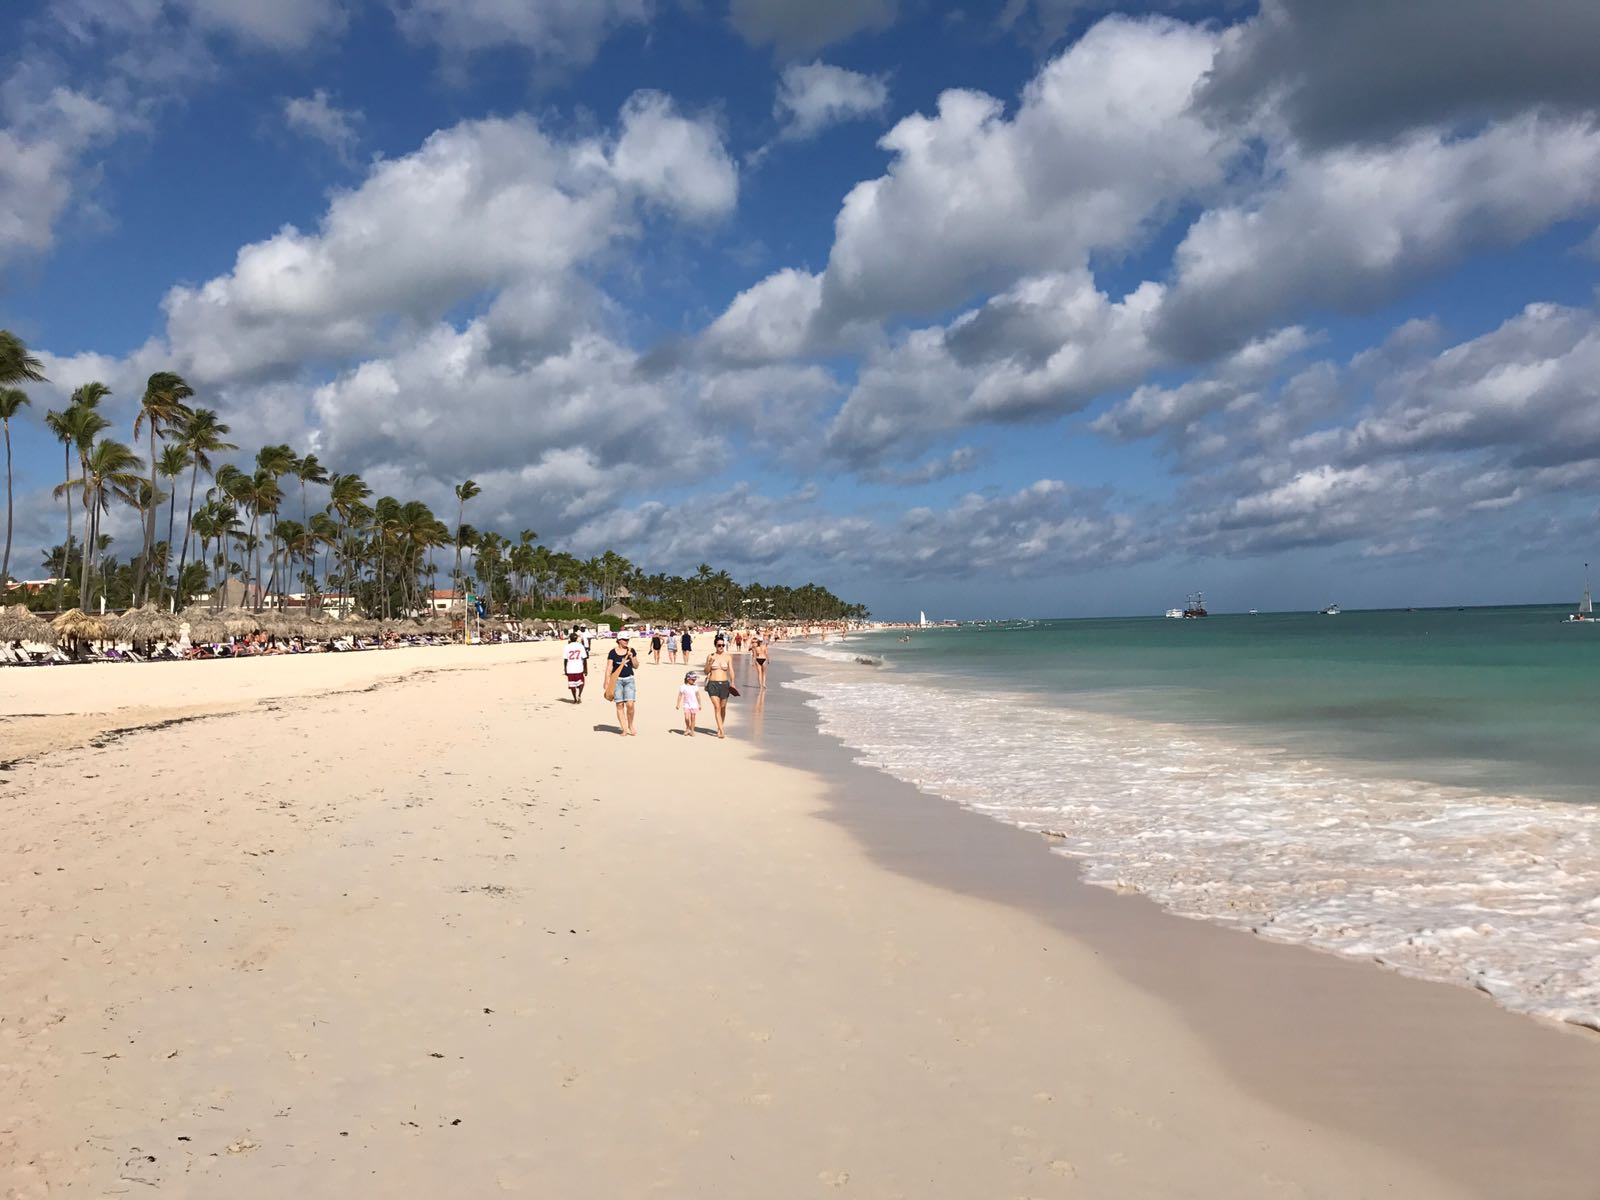 Punta Cana - Weg am Strand zum Shoppingvillage Palma Real